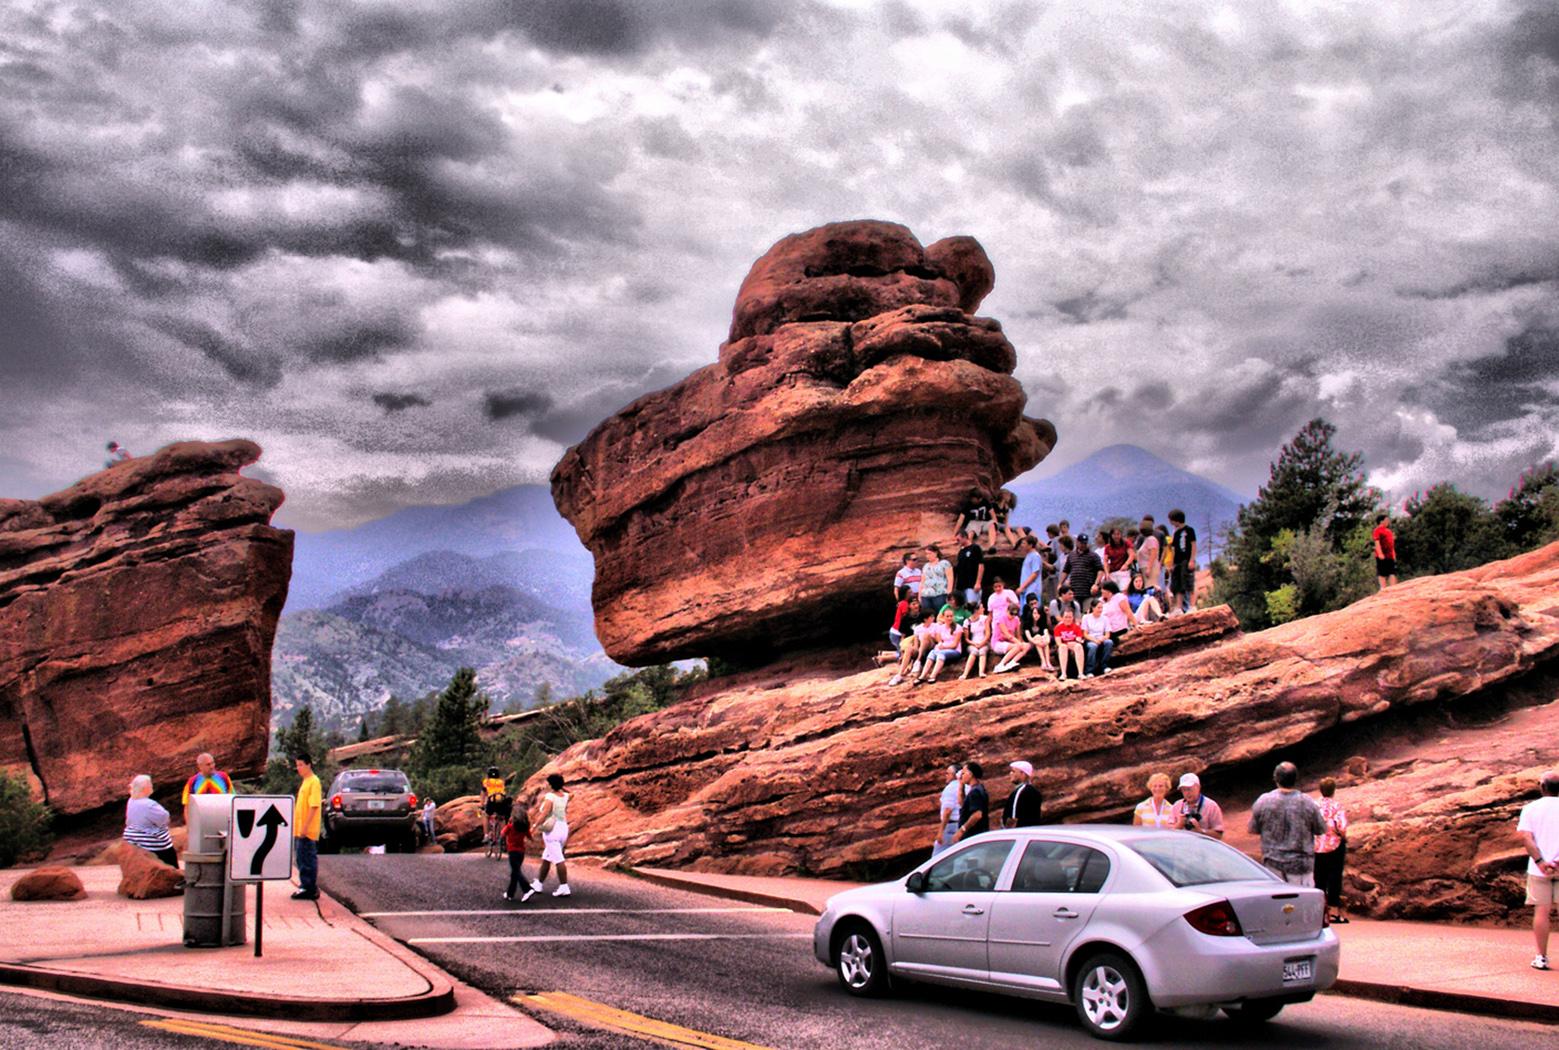 Balanced Rock, Automobile, Car, Cliffs, Clouds, HQ Photo